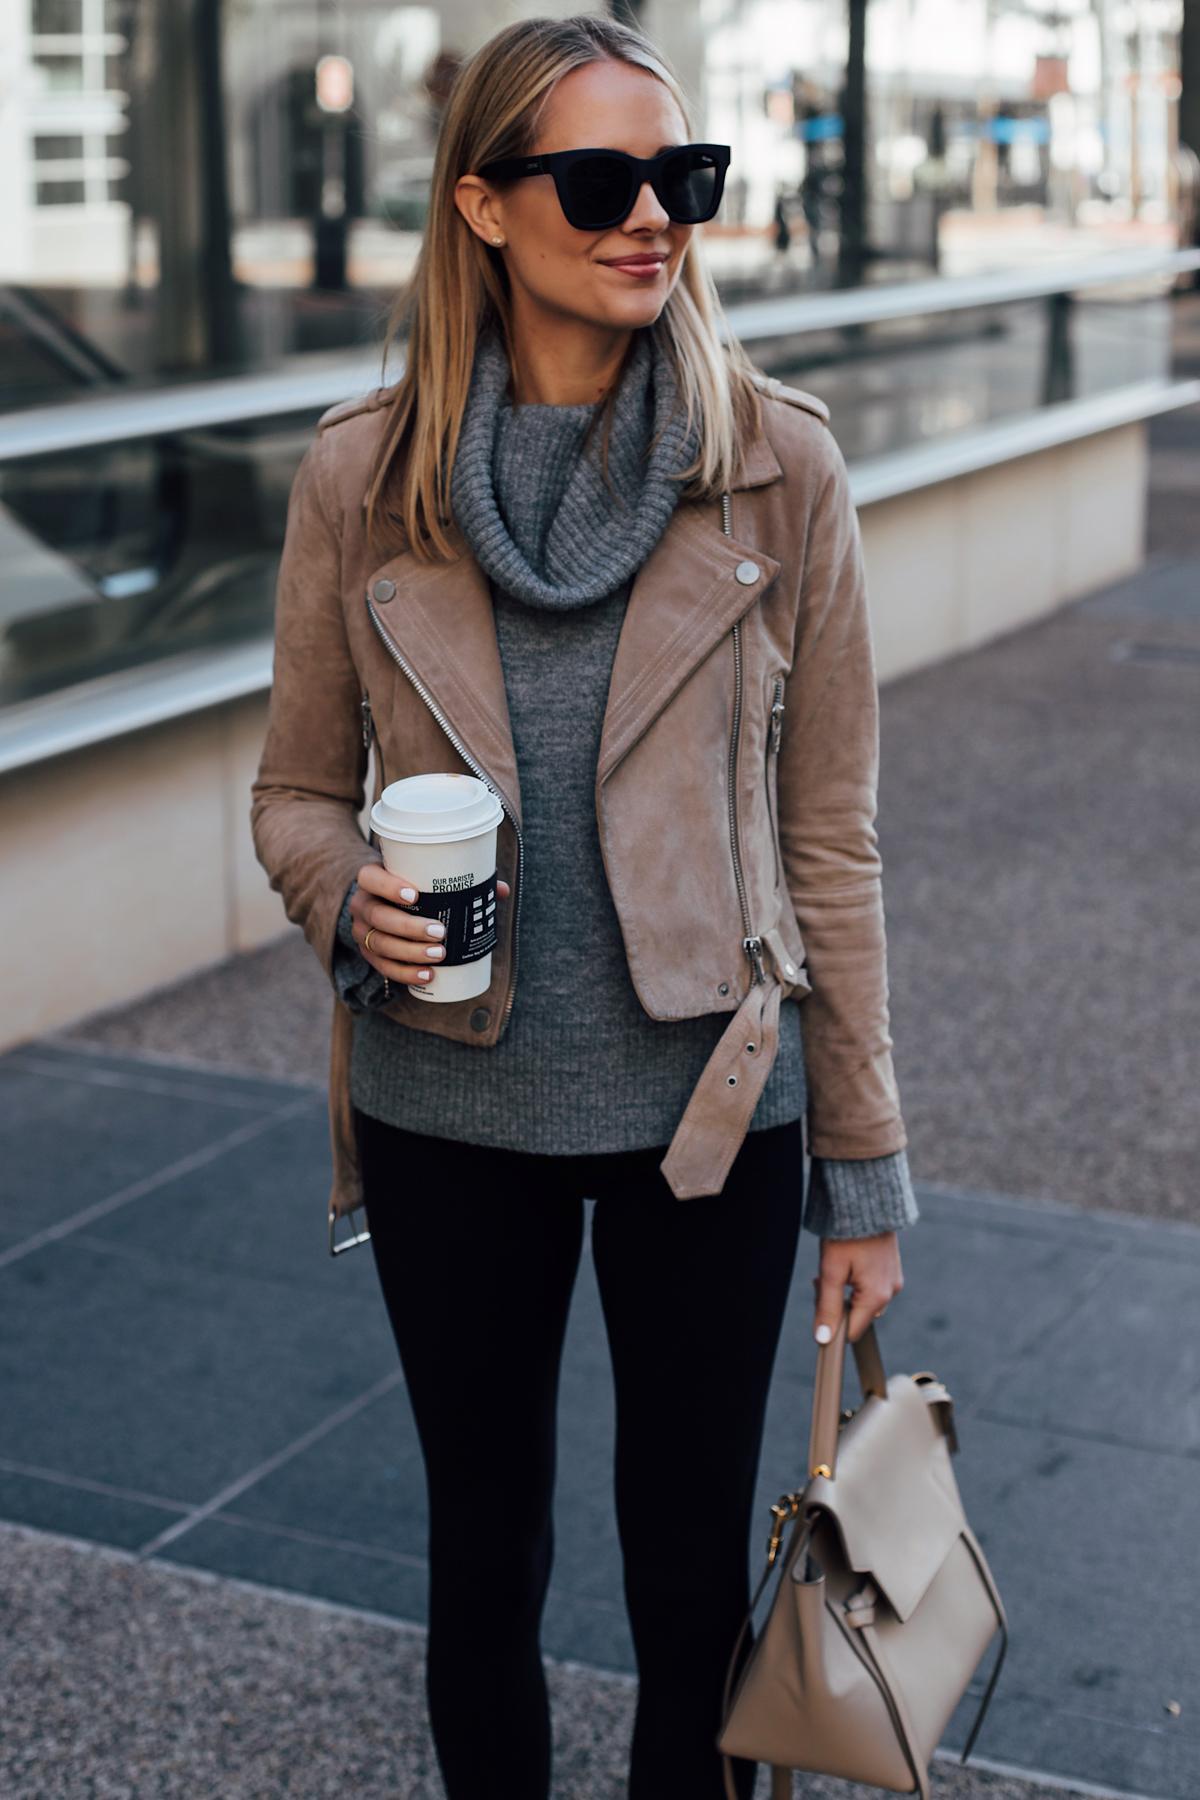 Blonde Woman Wearing Blanknyc Tan Suede Moto Jacket Grey Turtleneck Sweater Black Leggings Celine Mini Belt Bag Fashion Jackson San Diego Fashion Blogger Street Style